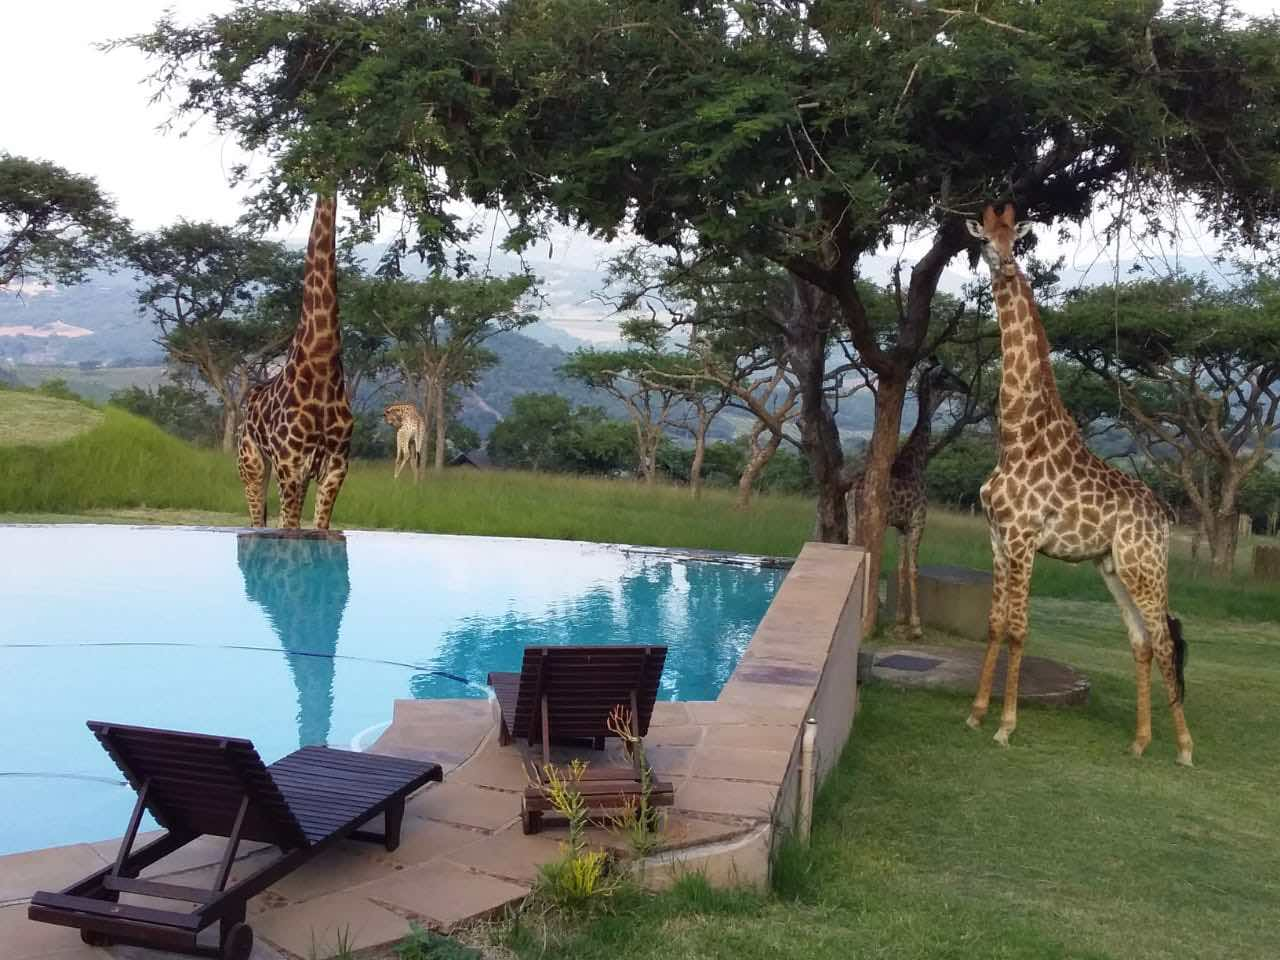 Giraffe_Muluwa_poolside_3